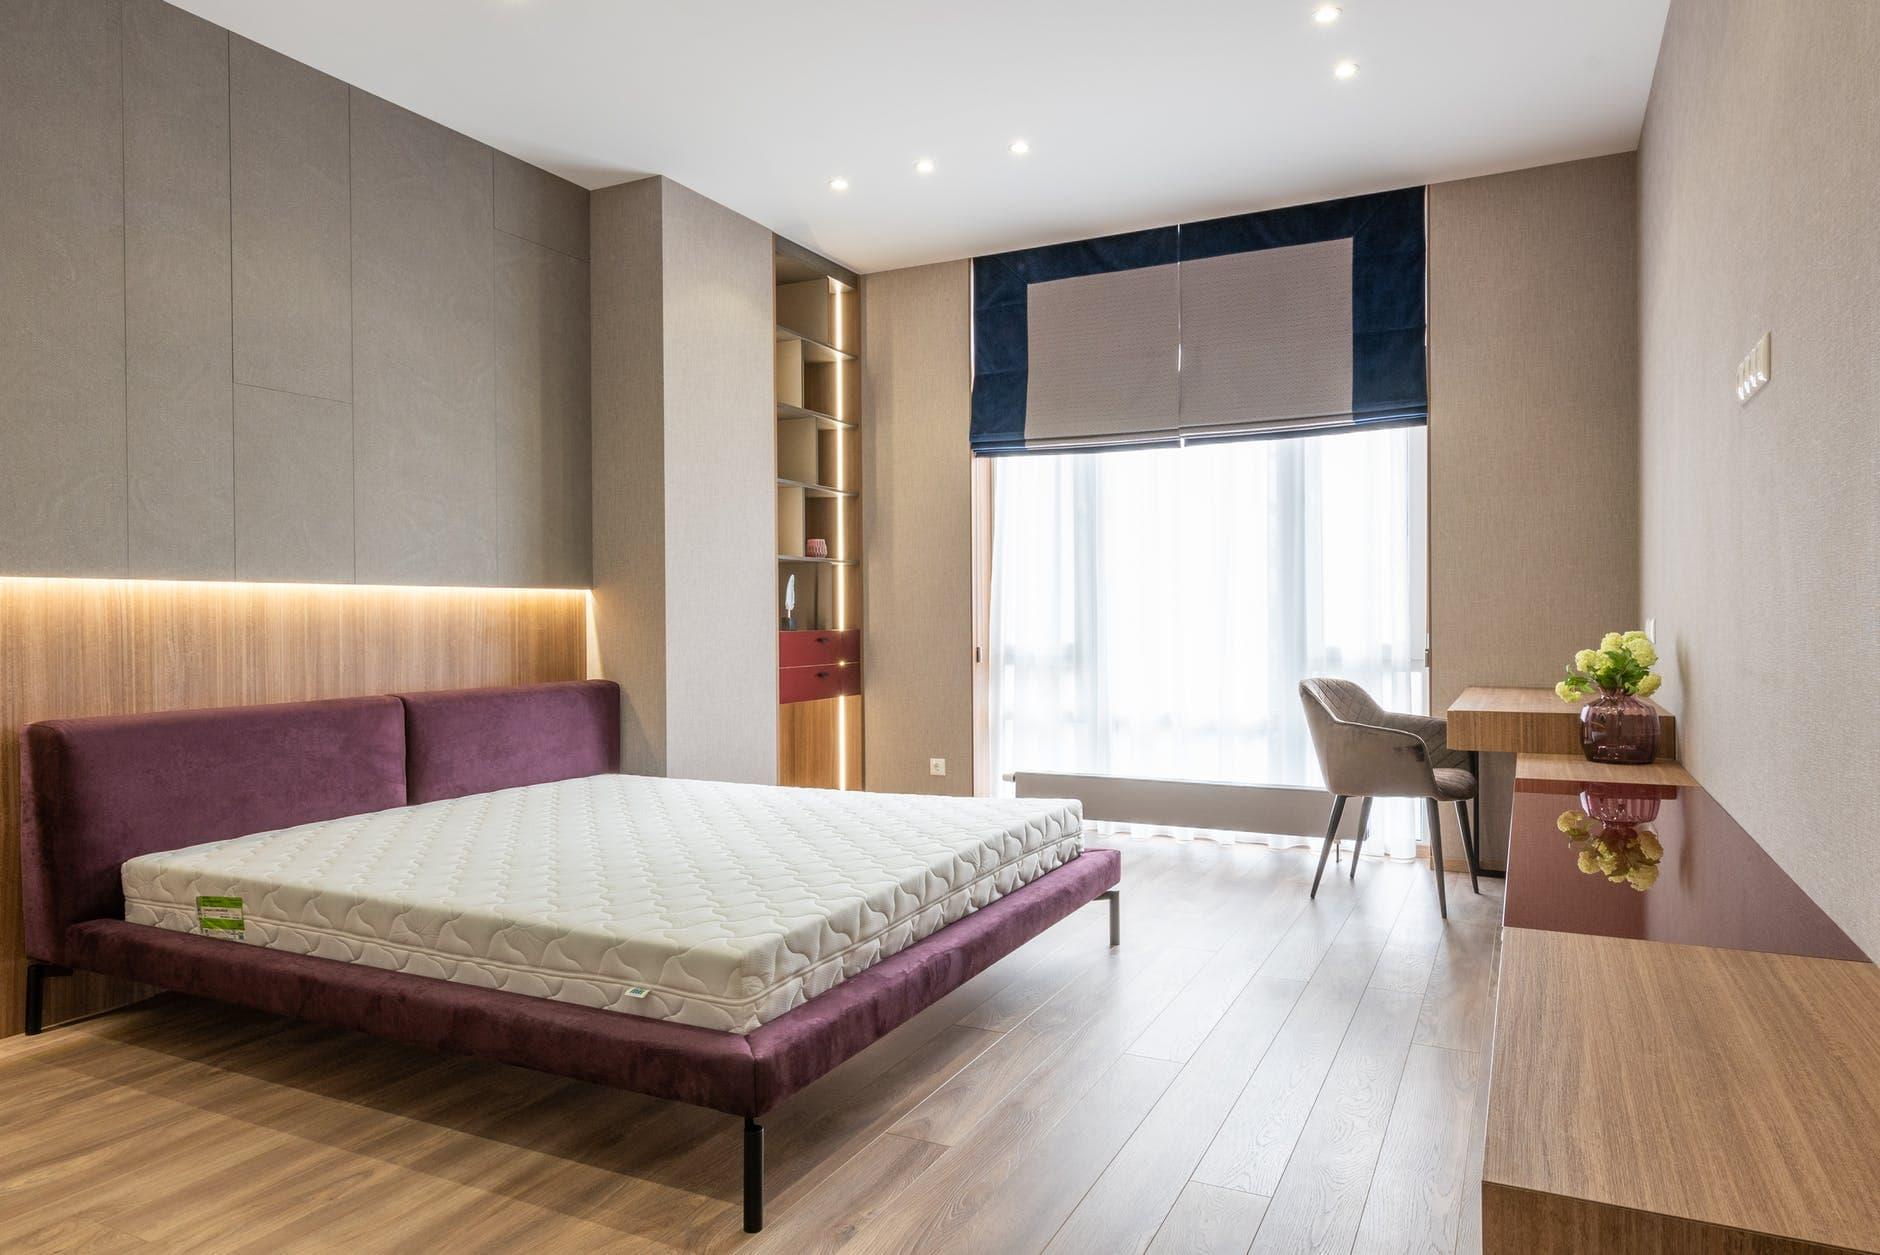 spacious empty bedroom in stylish design